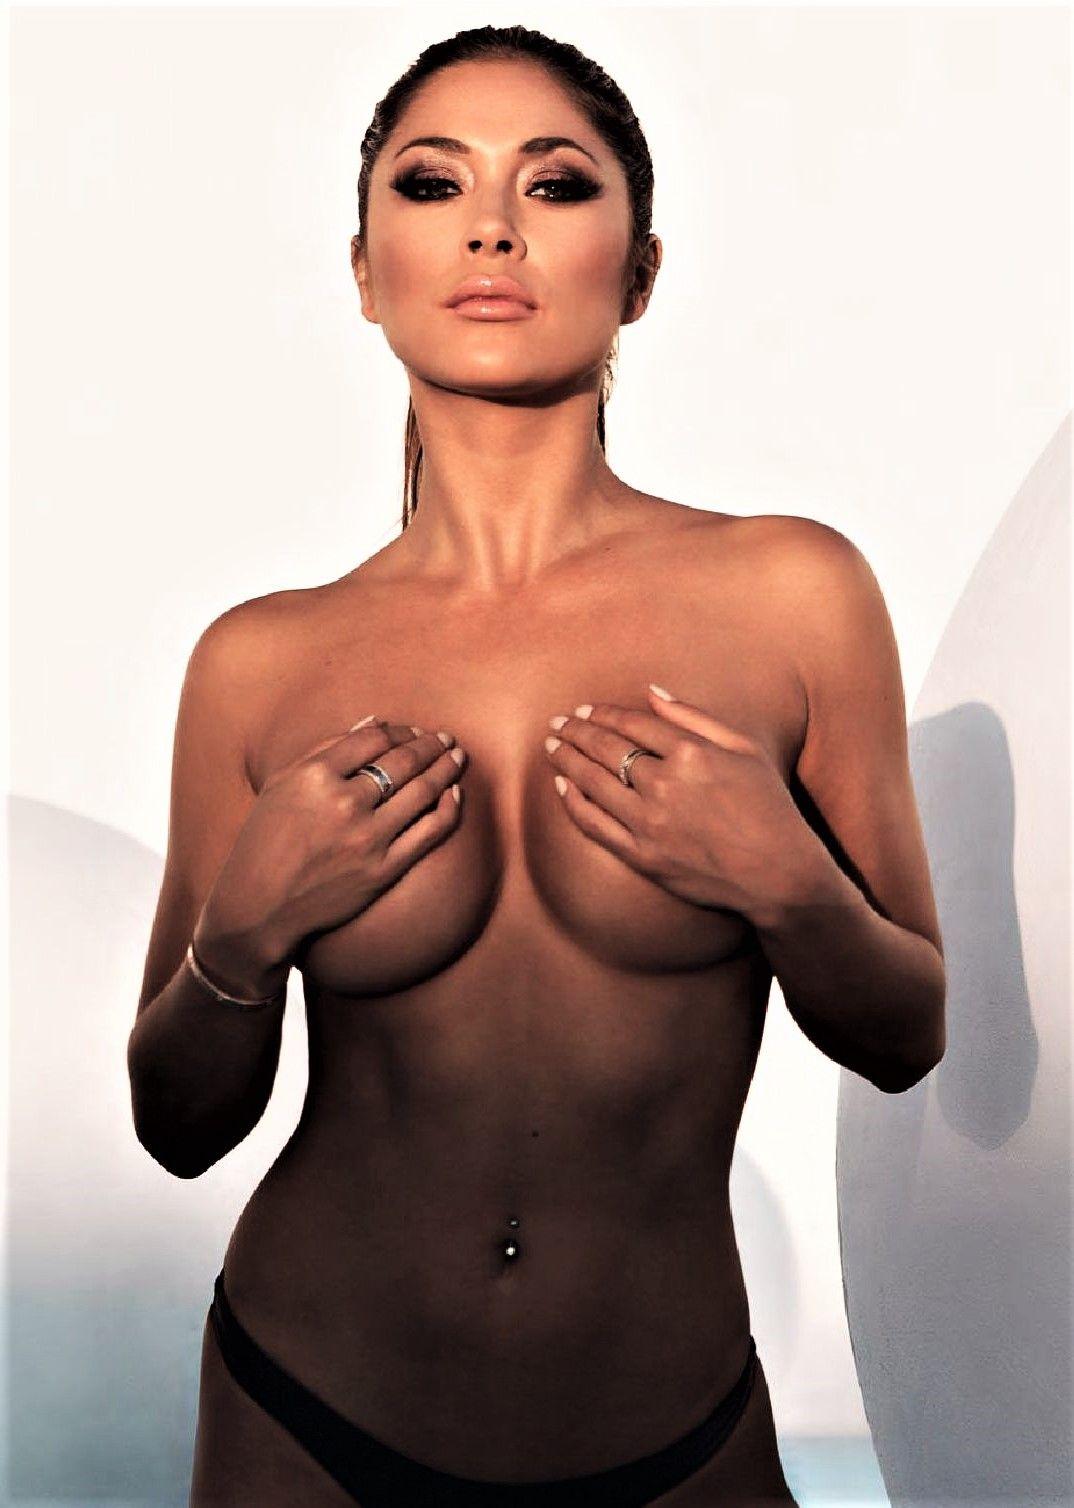 Cleavage Amelia Jane naked (12 photo), Ass, Paparazzi, Boobs, cleavage 2017